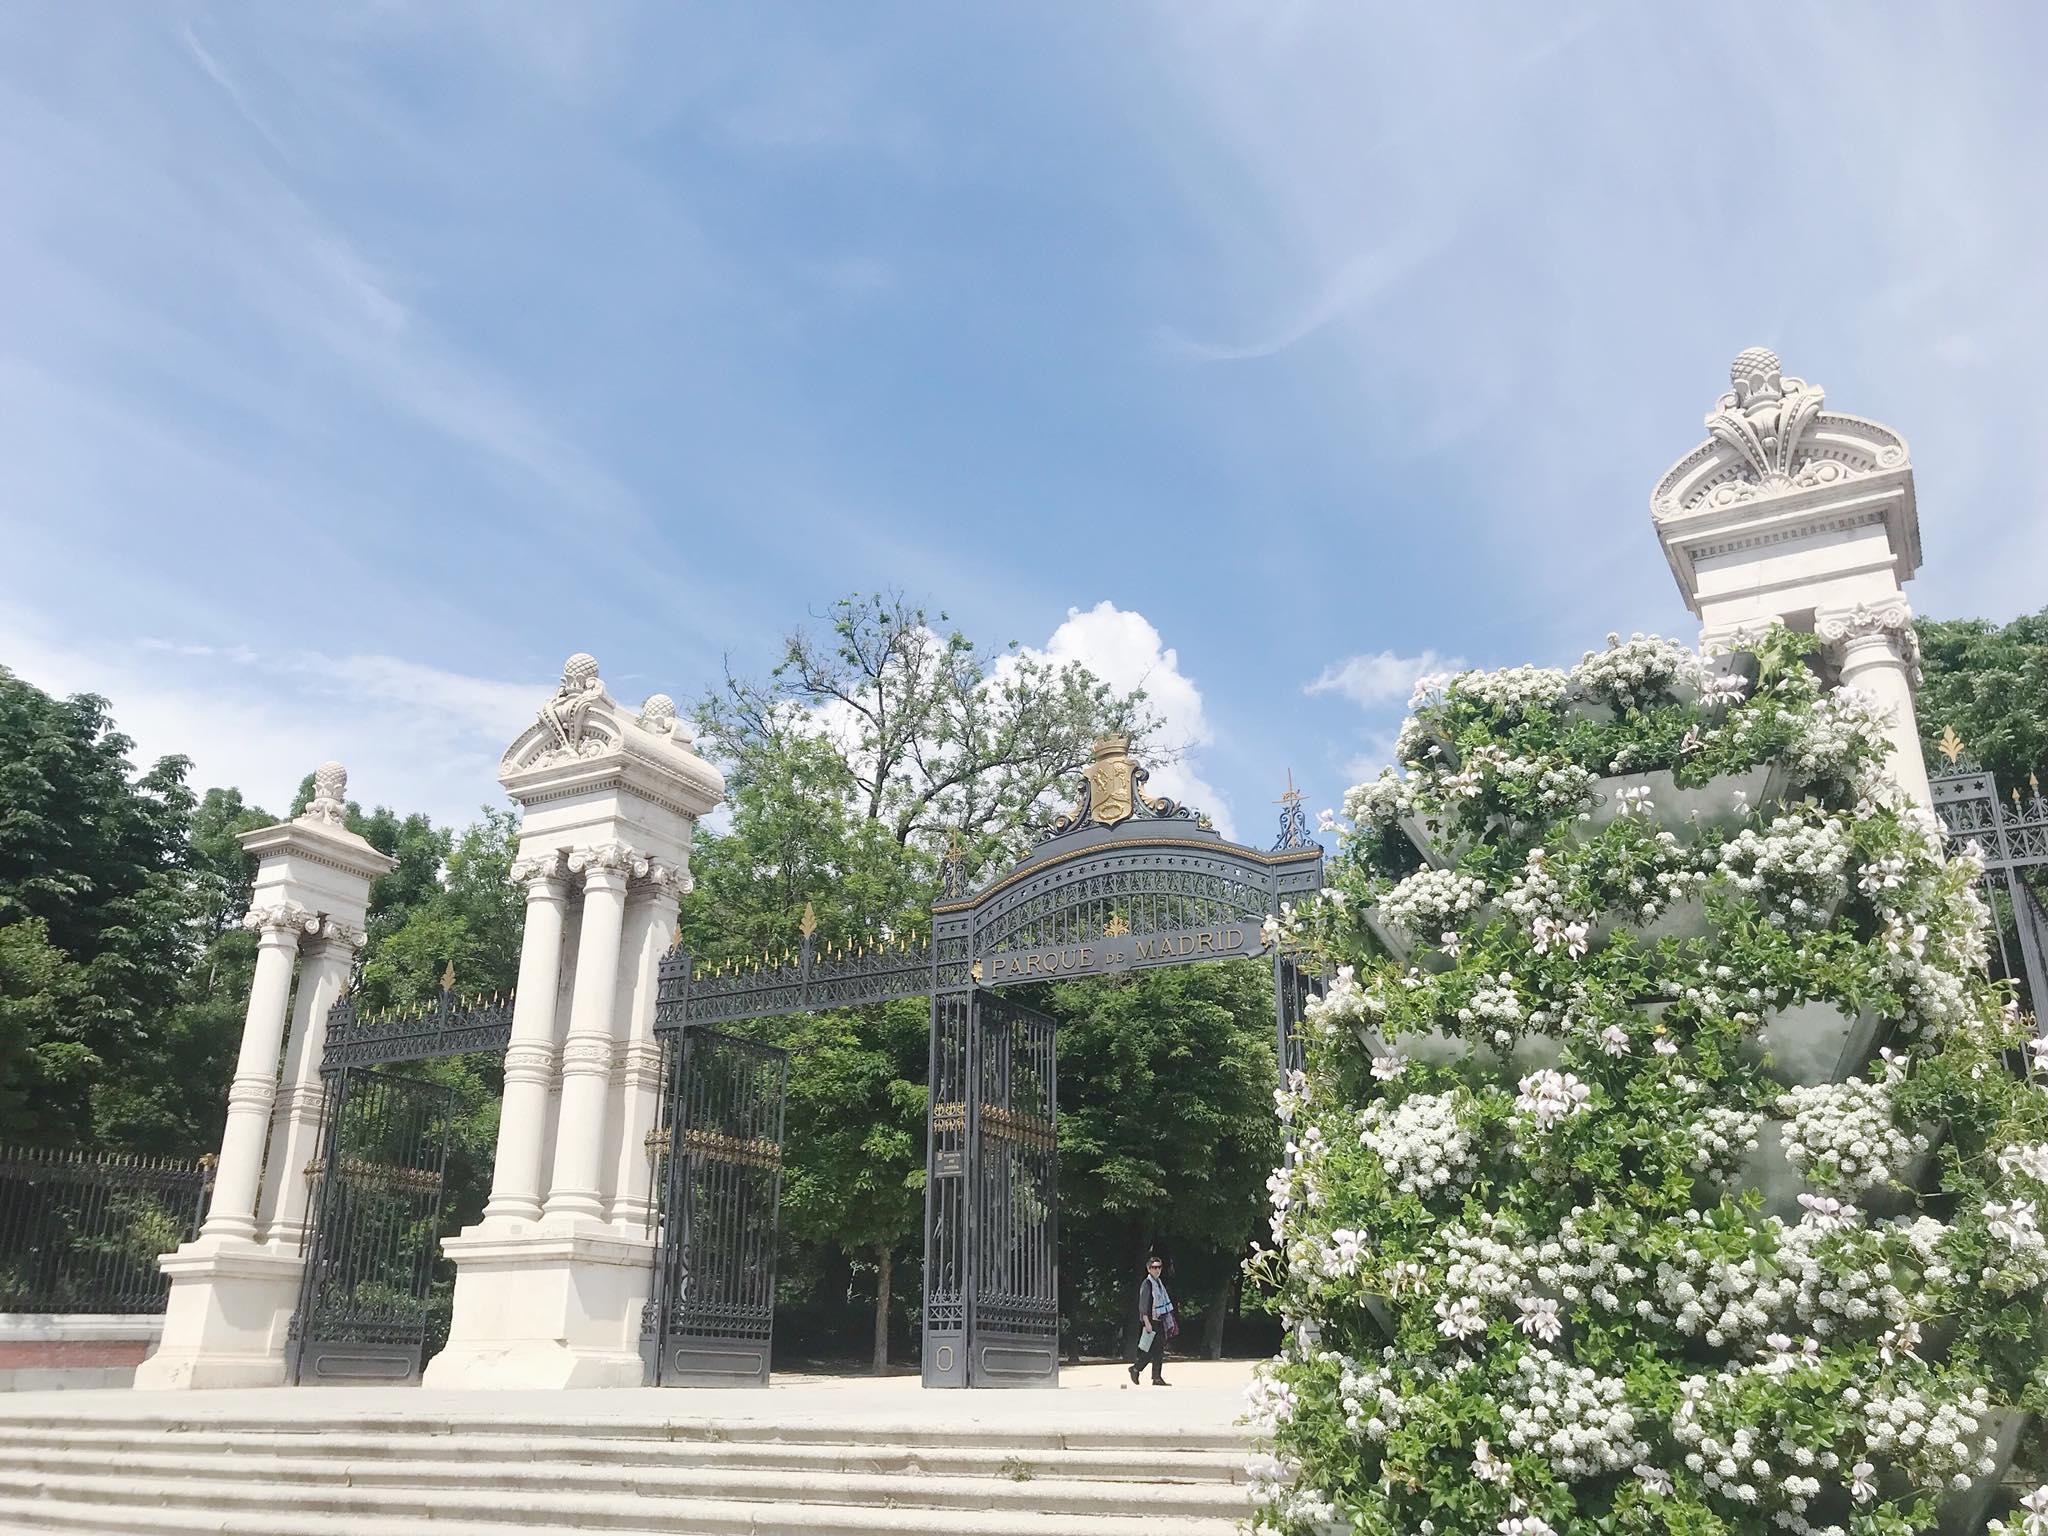 An entrance to Buen Retiro Park, Madrid